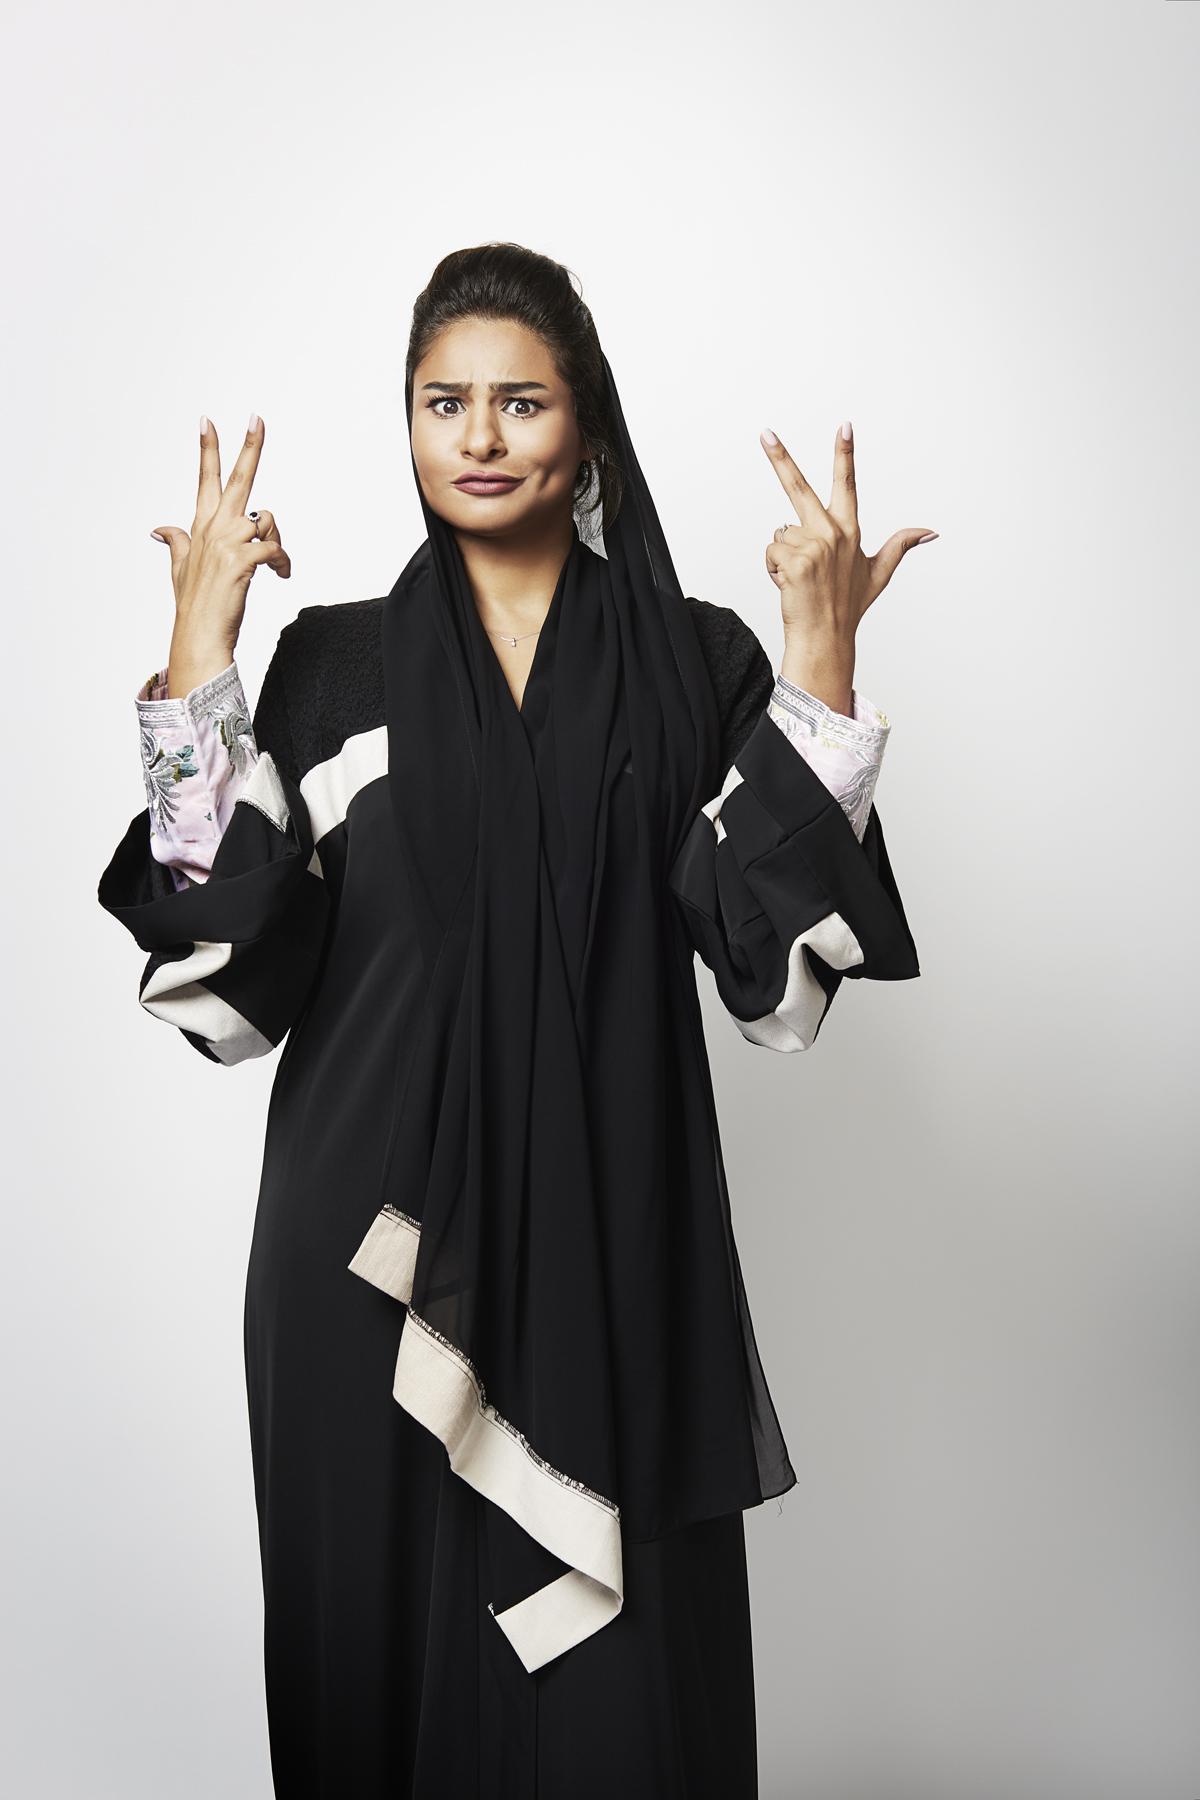 RanaldMackechnie.ADNOC Emirati Women's Day8.jpg